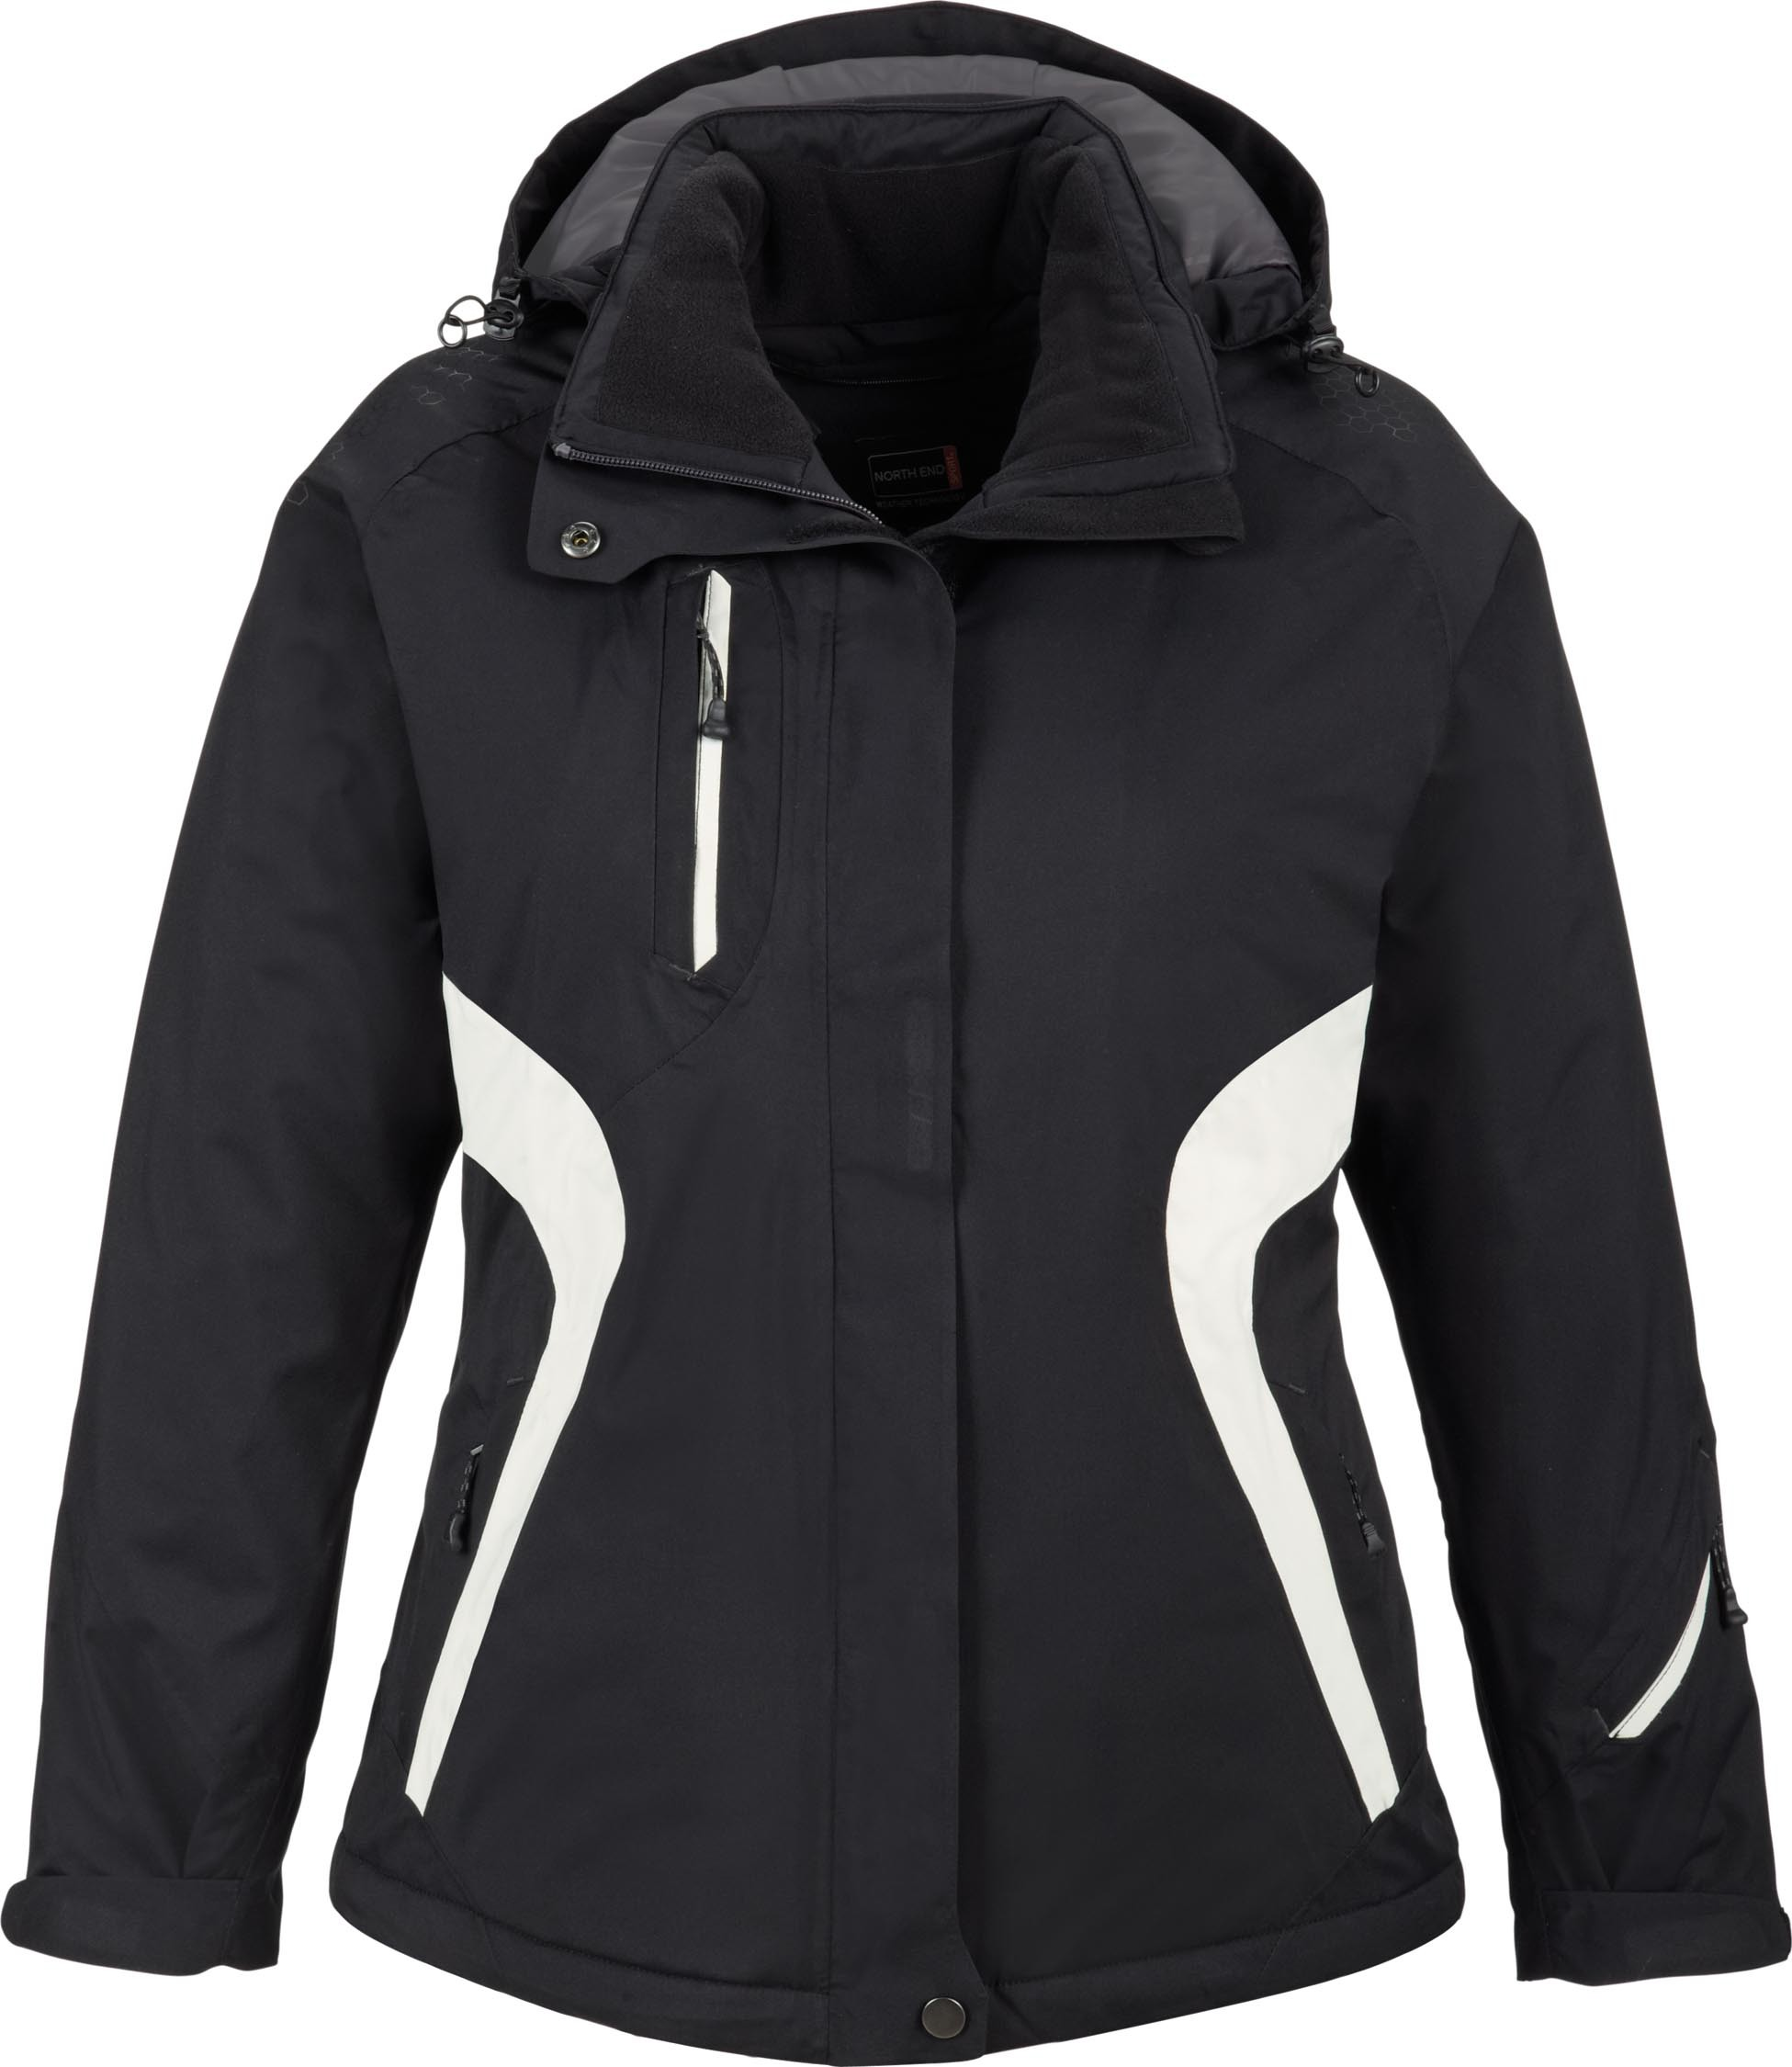 Ash City UTK 3 Warm.Logik 78664 - Apex Ladies' Insulated Seam-Sealed Jacket